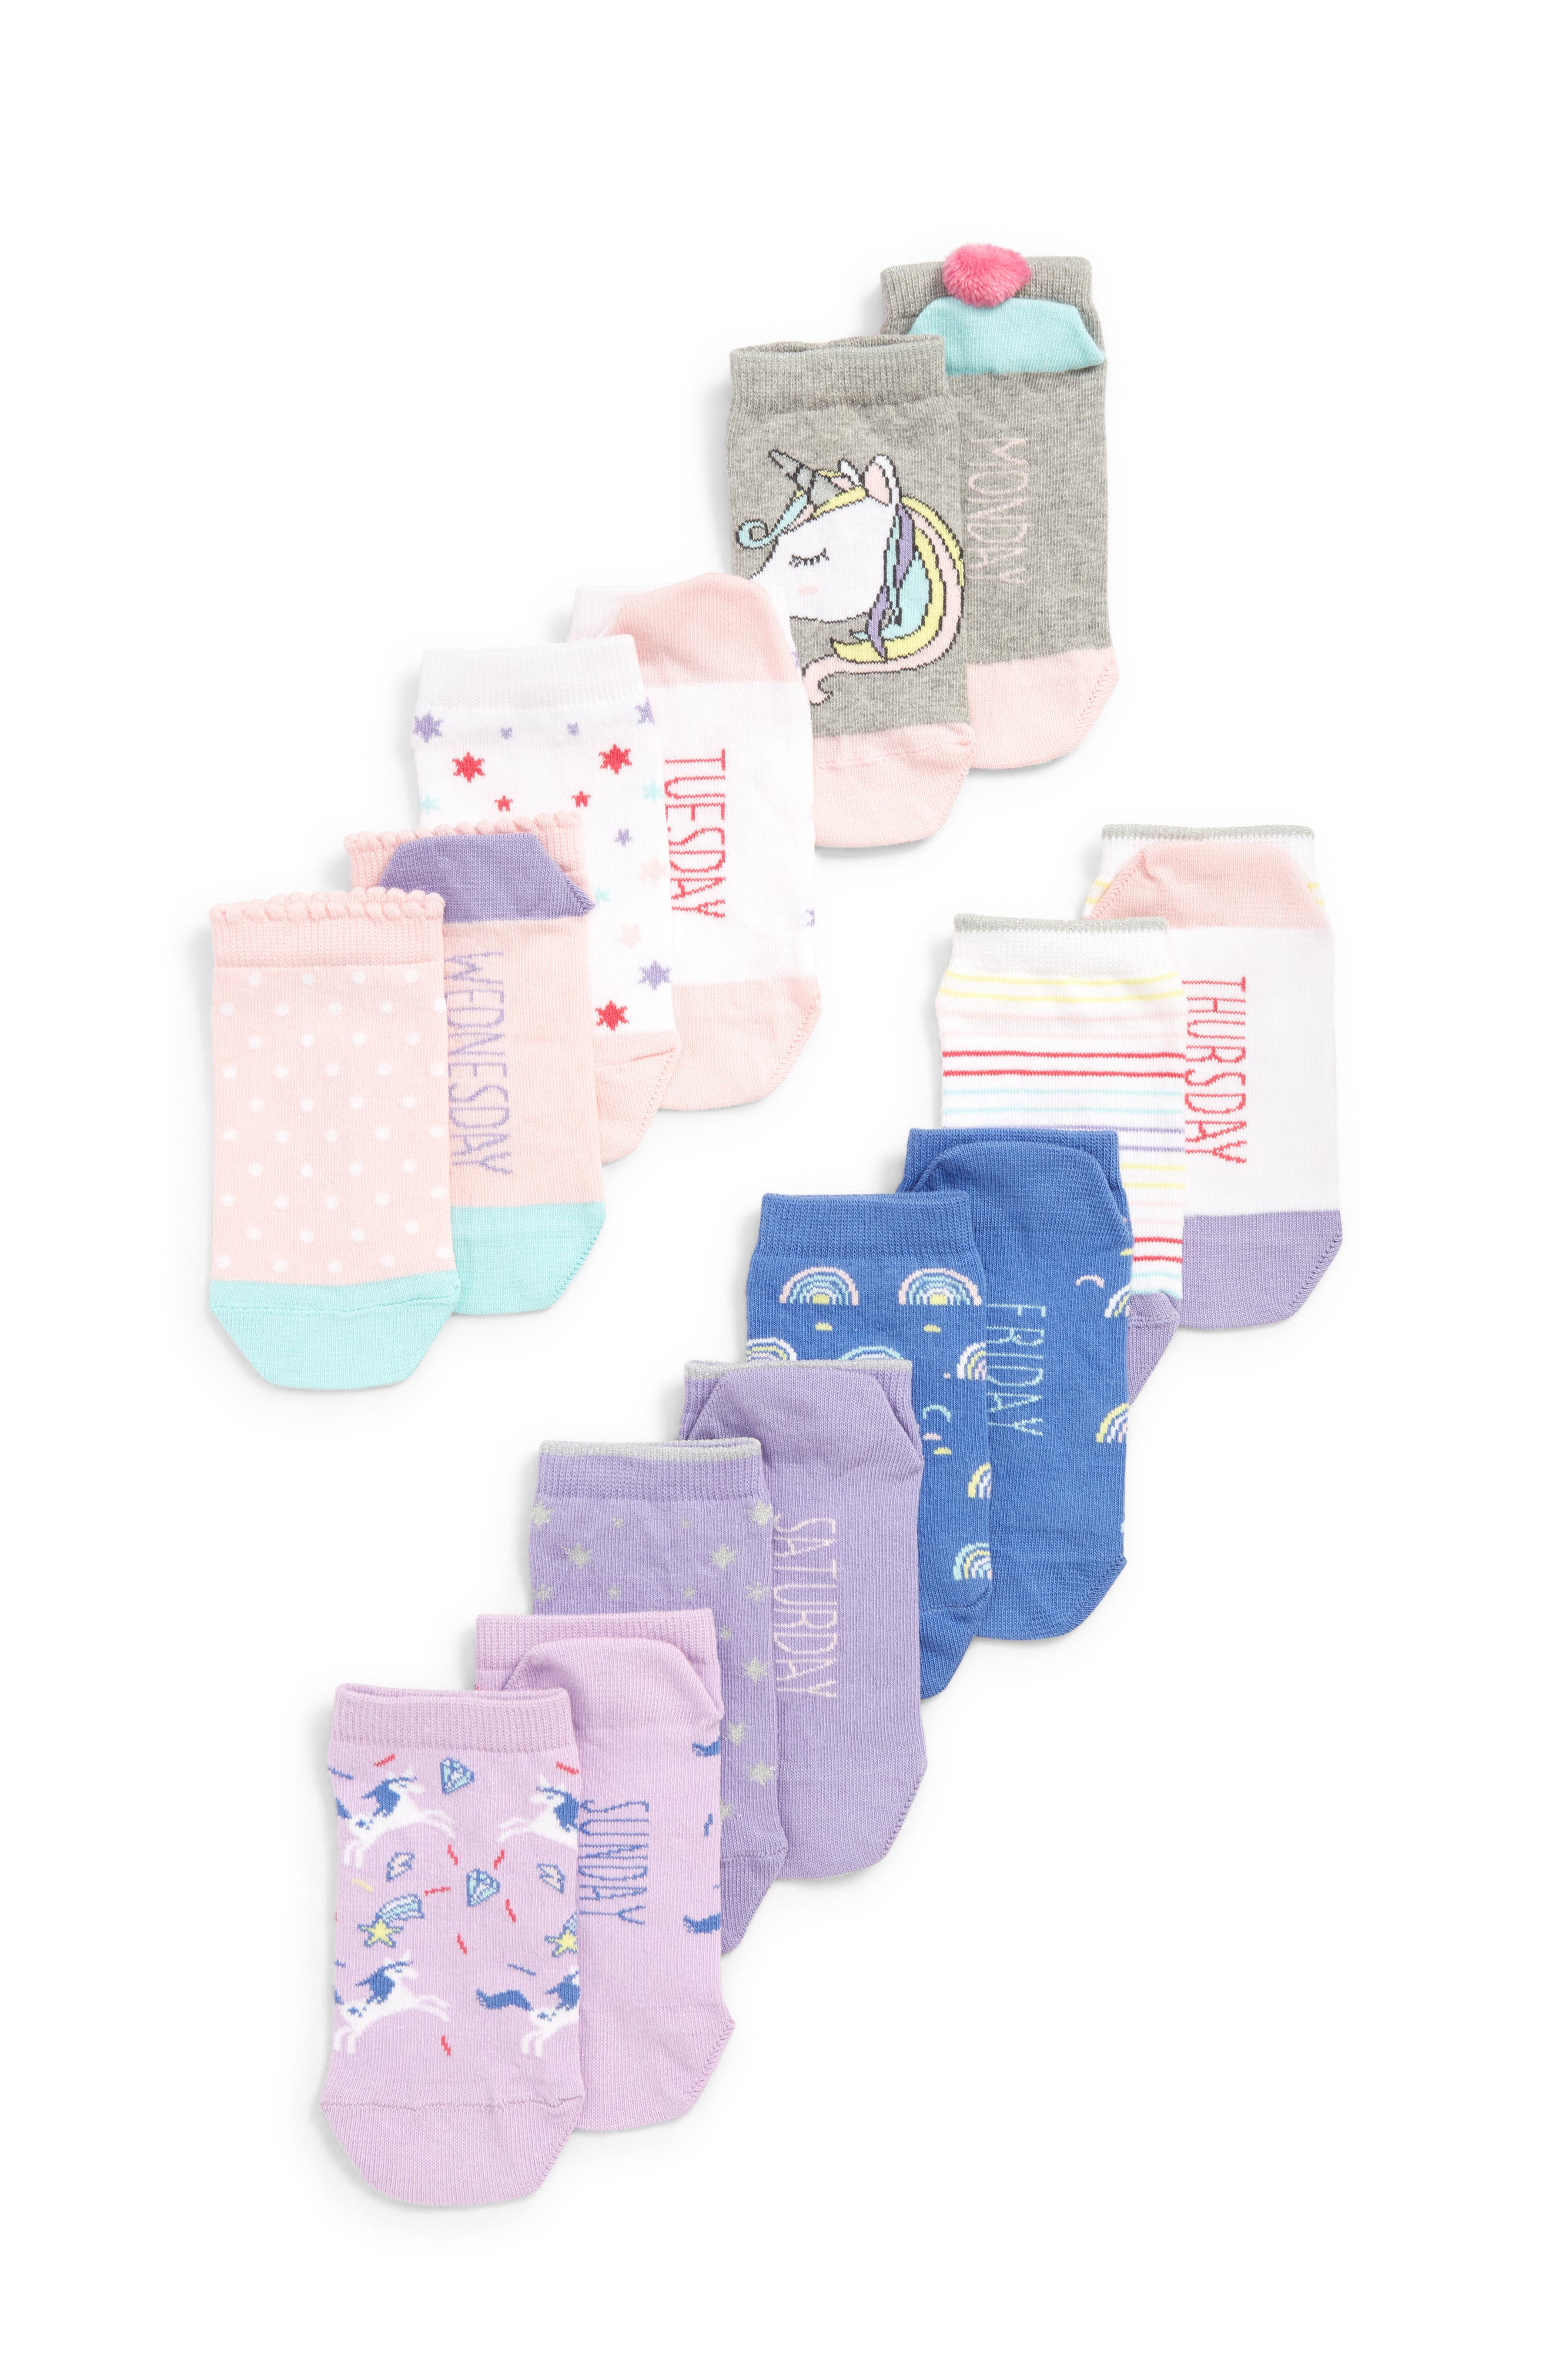 Toddler Girls Tucker  Tate 7Pack Days Of The Week Socks Size 4585 EU  Pink